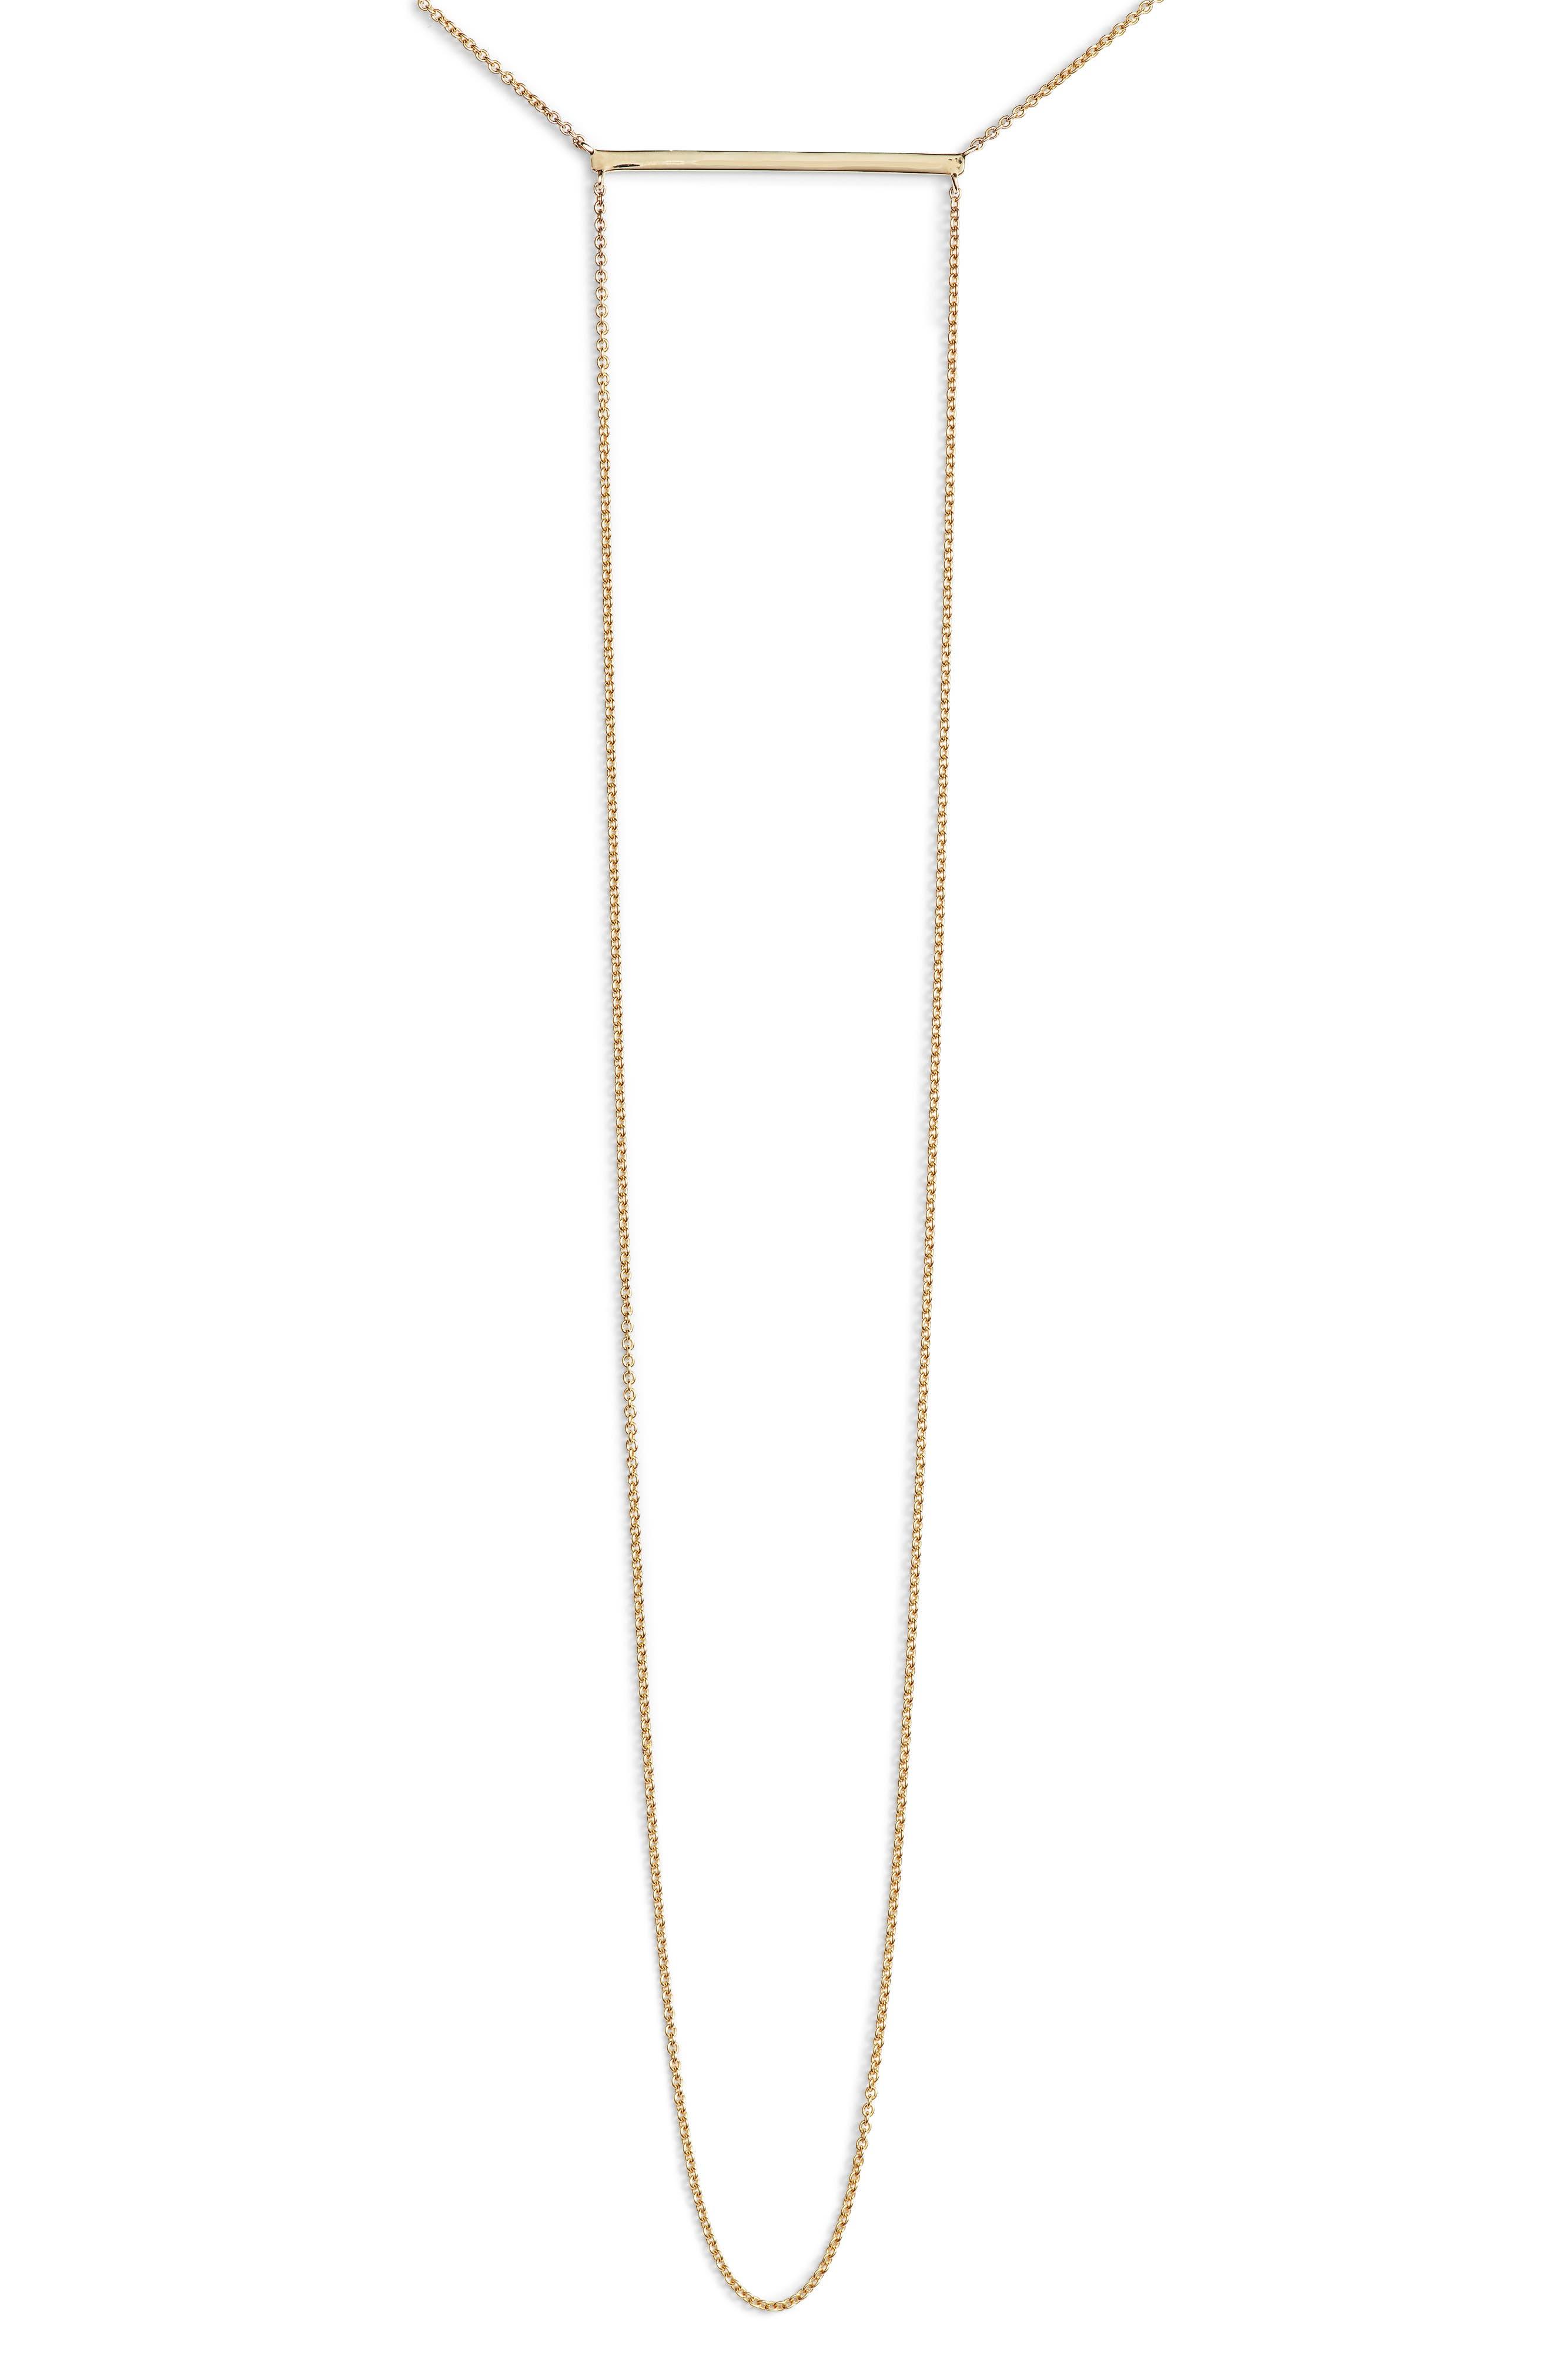 Drama Bar Pendant Necklace,                         Main,                         color, YELLOW GOLD